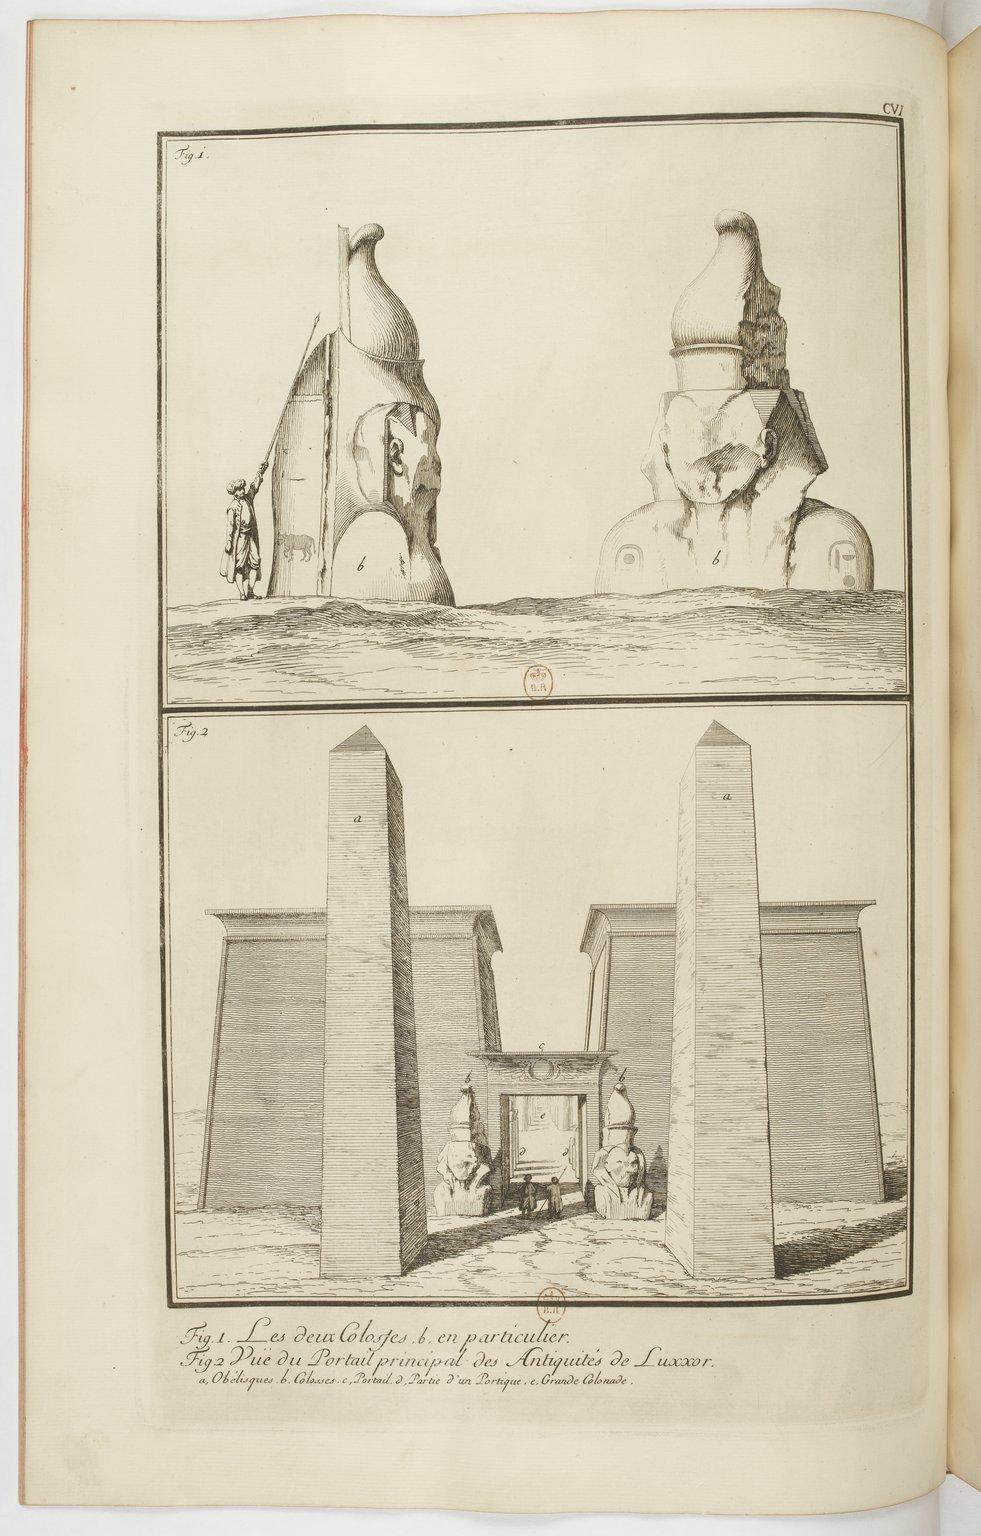 Frederic Norden, Luxor Temple, 1737